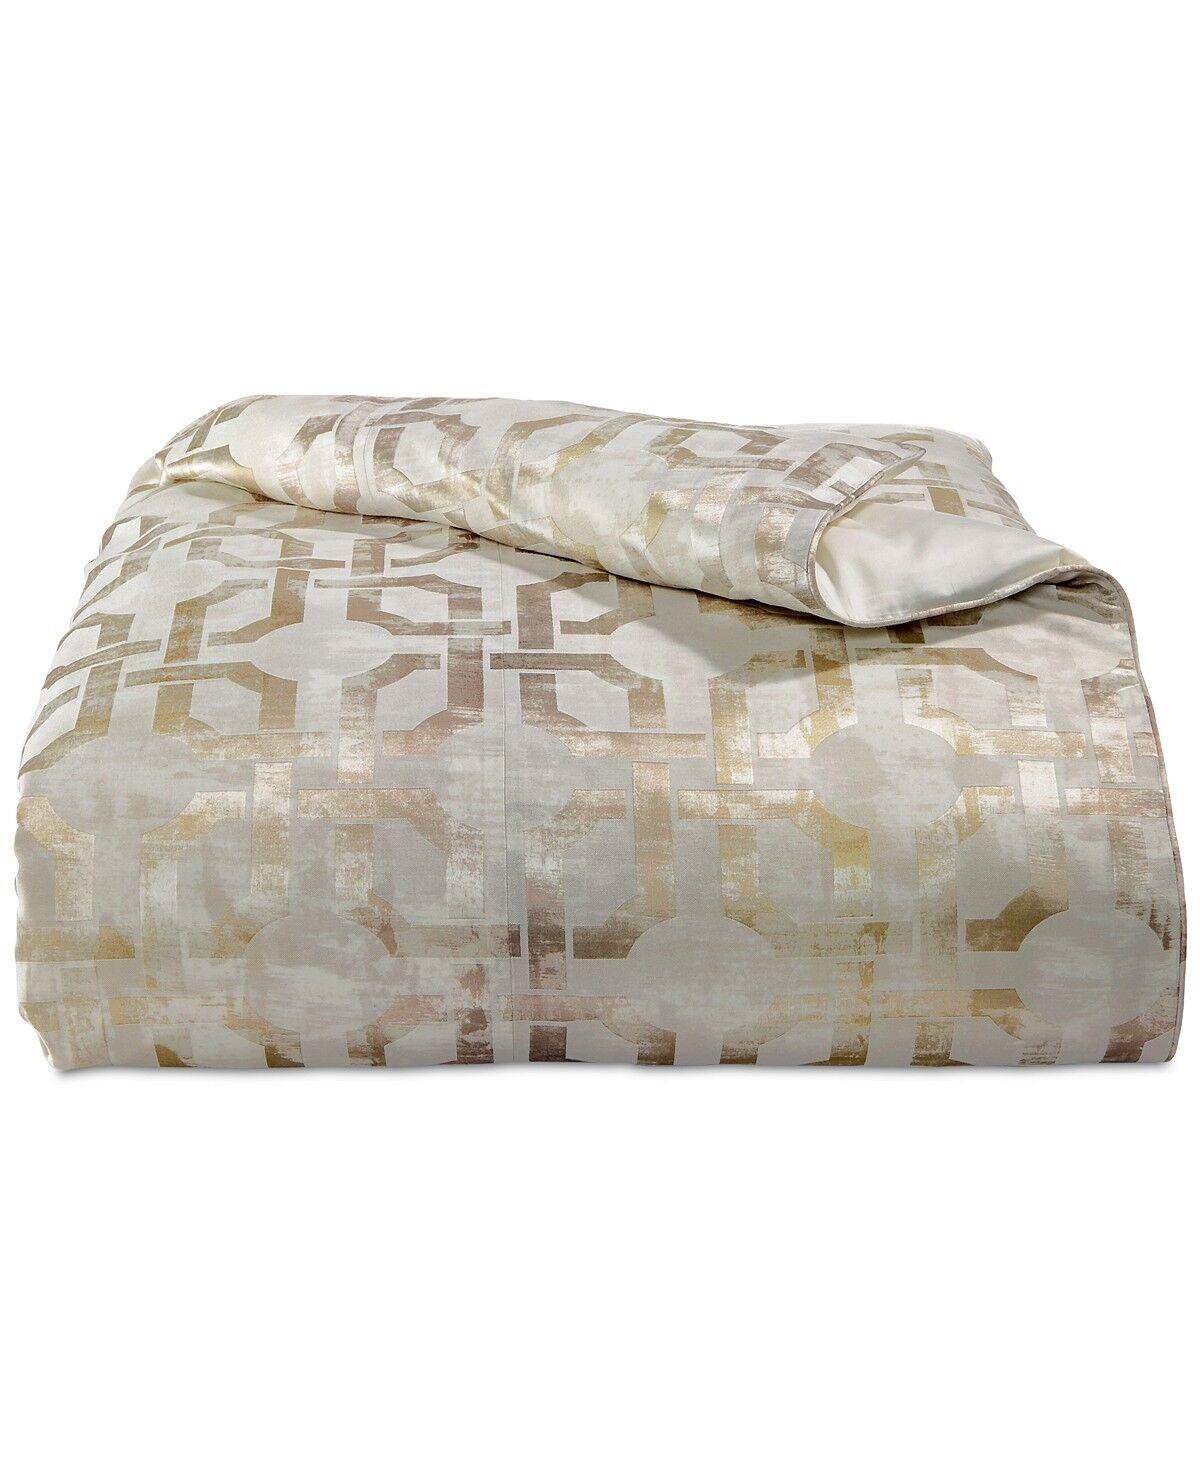 nouveau Hotel Collection Bedding Fresco FULL QUEEN Duvet Cover or  335 i1454